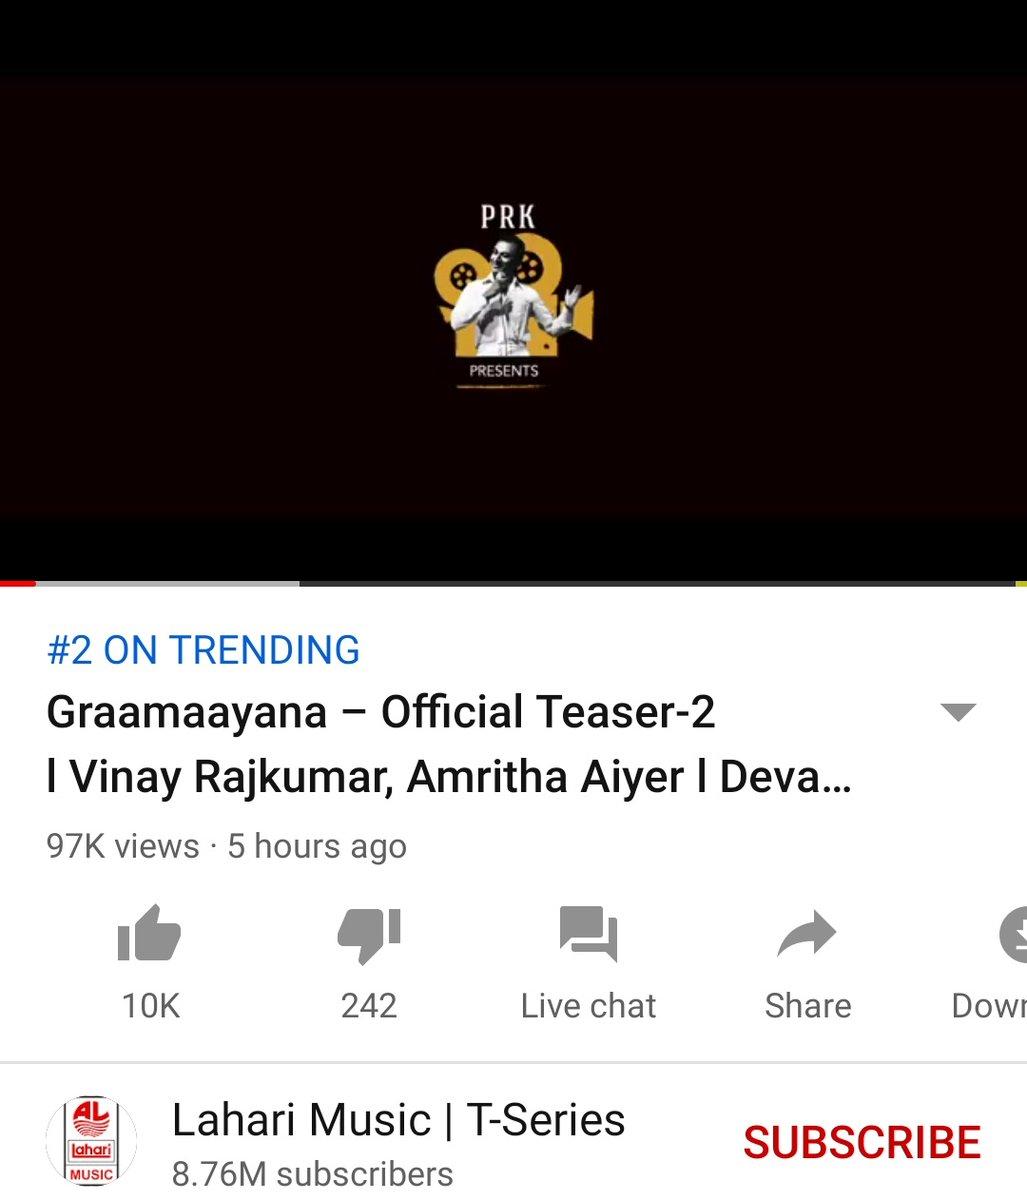 #Graamaayana teaser trending at number 2. Giod response 👍vinay brother looks promising 👌 @vinayrajkumar @Official_RRK @PuneethRajkumar @LahariMusic @PRK_Trends @PuneethFC17 @PuneethFans007